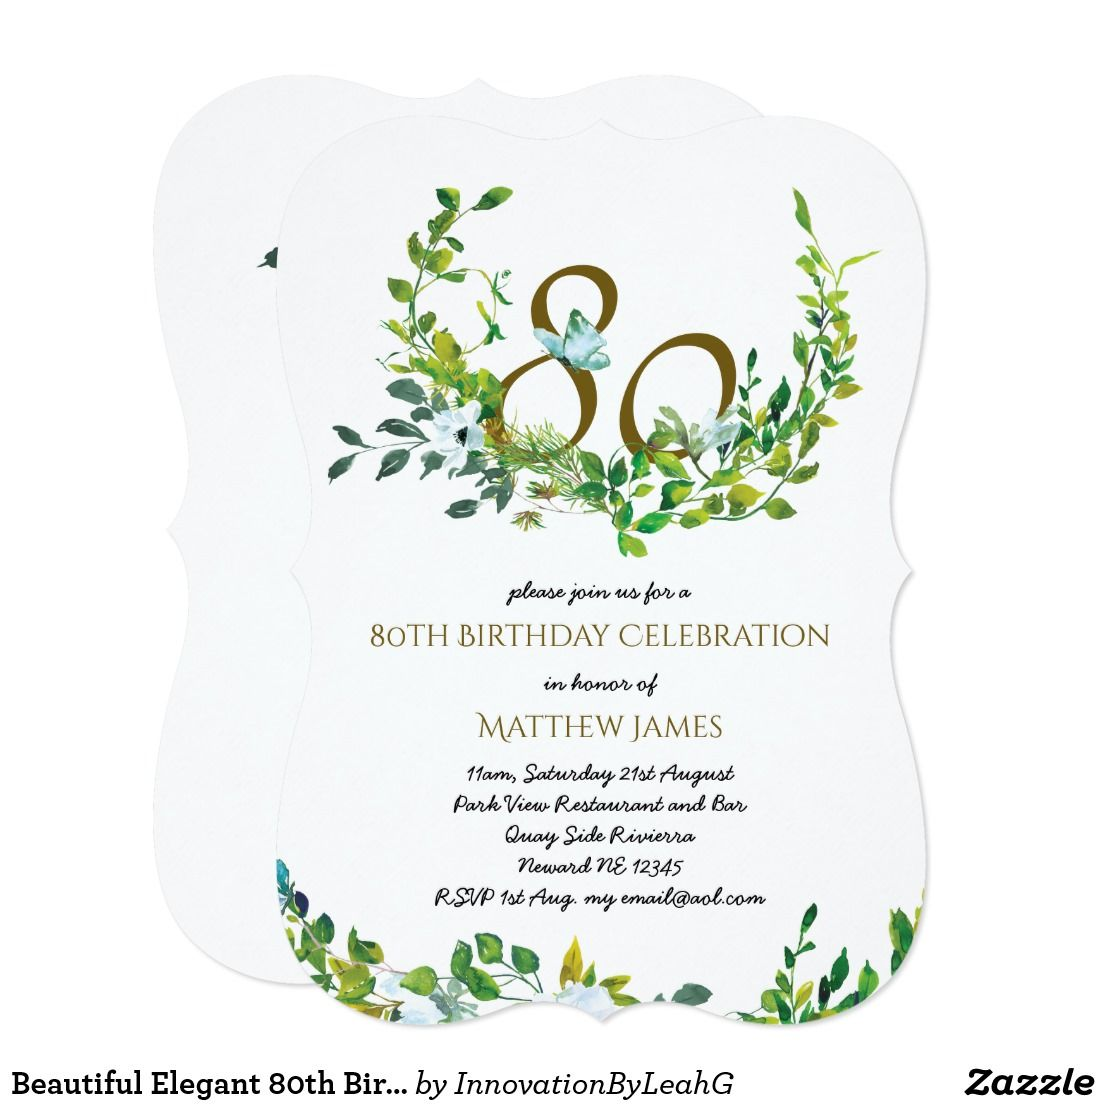 Beautiful Elegant 80th Birthday Invitations Woman Zazzle